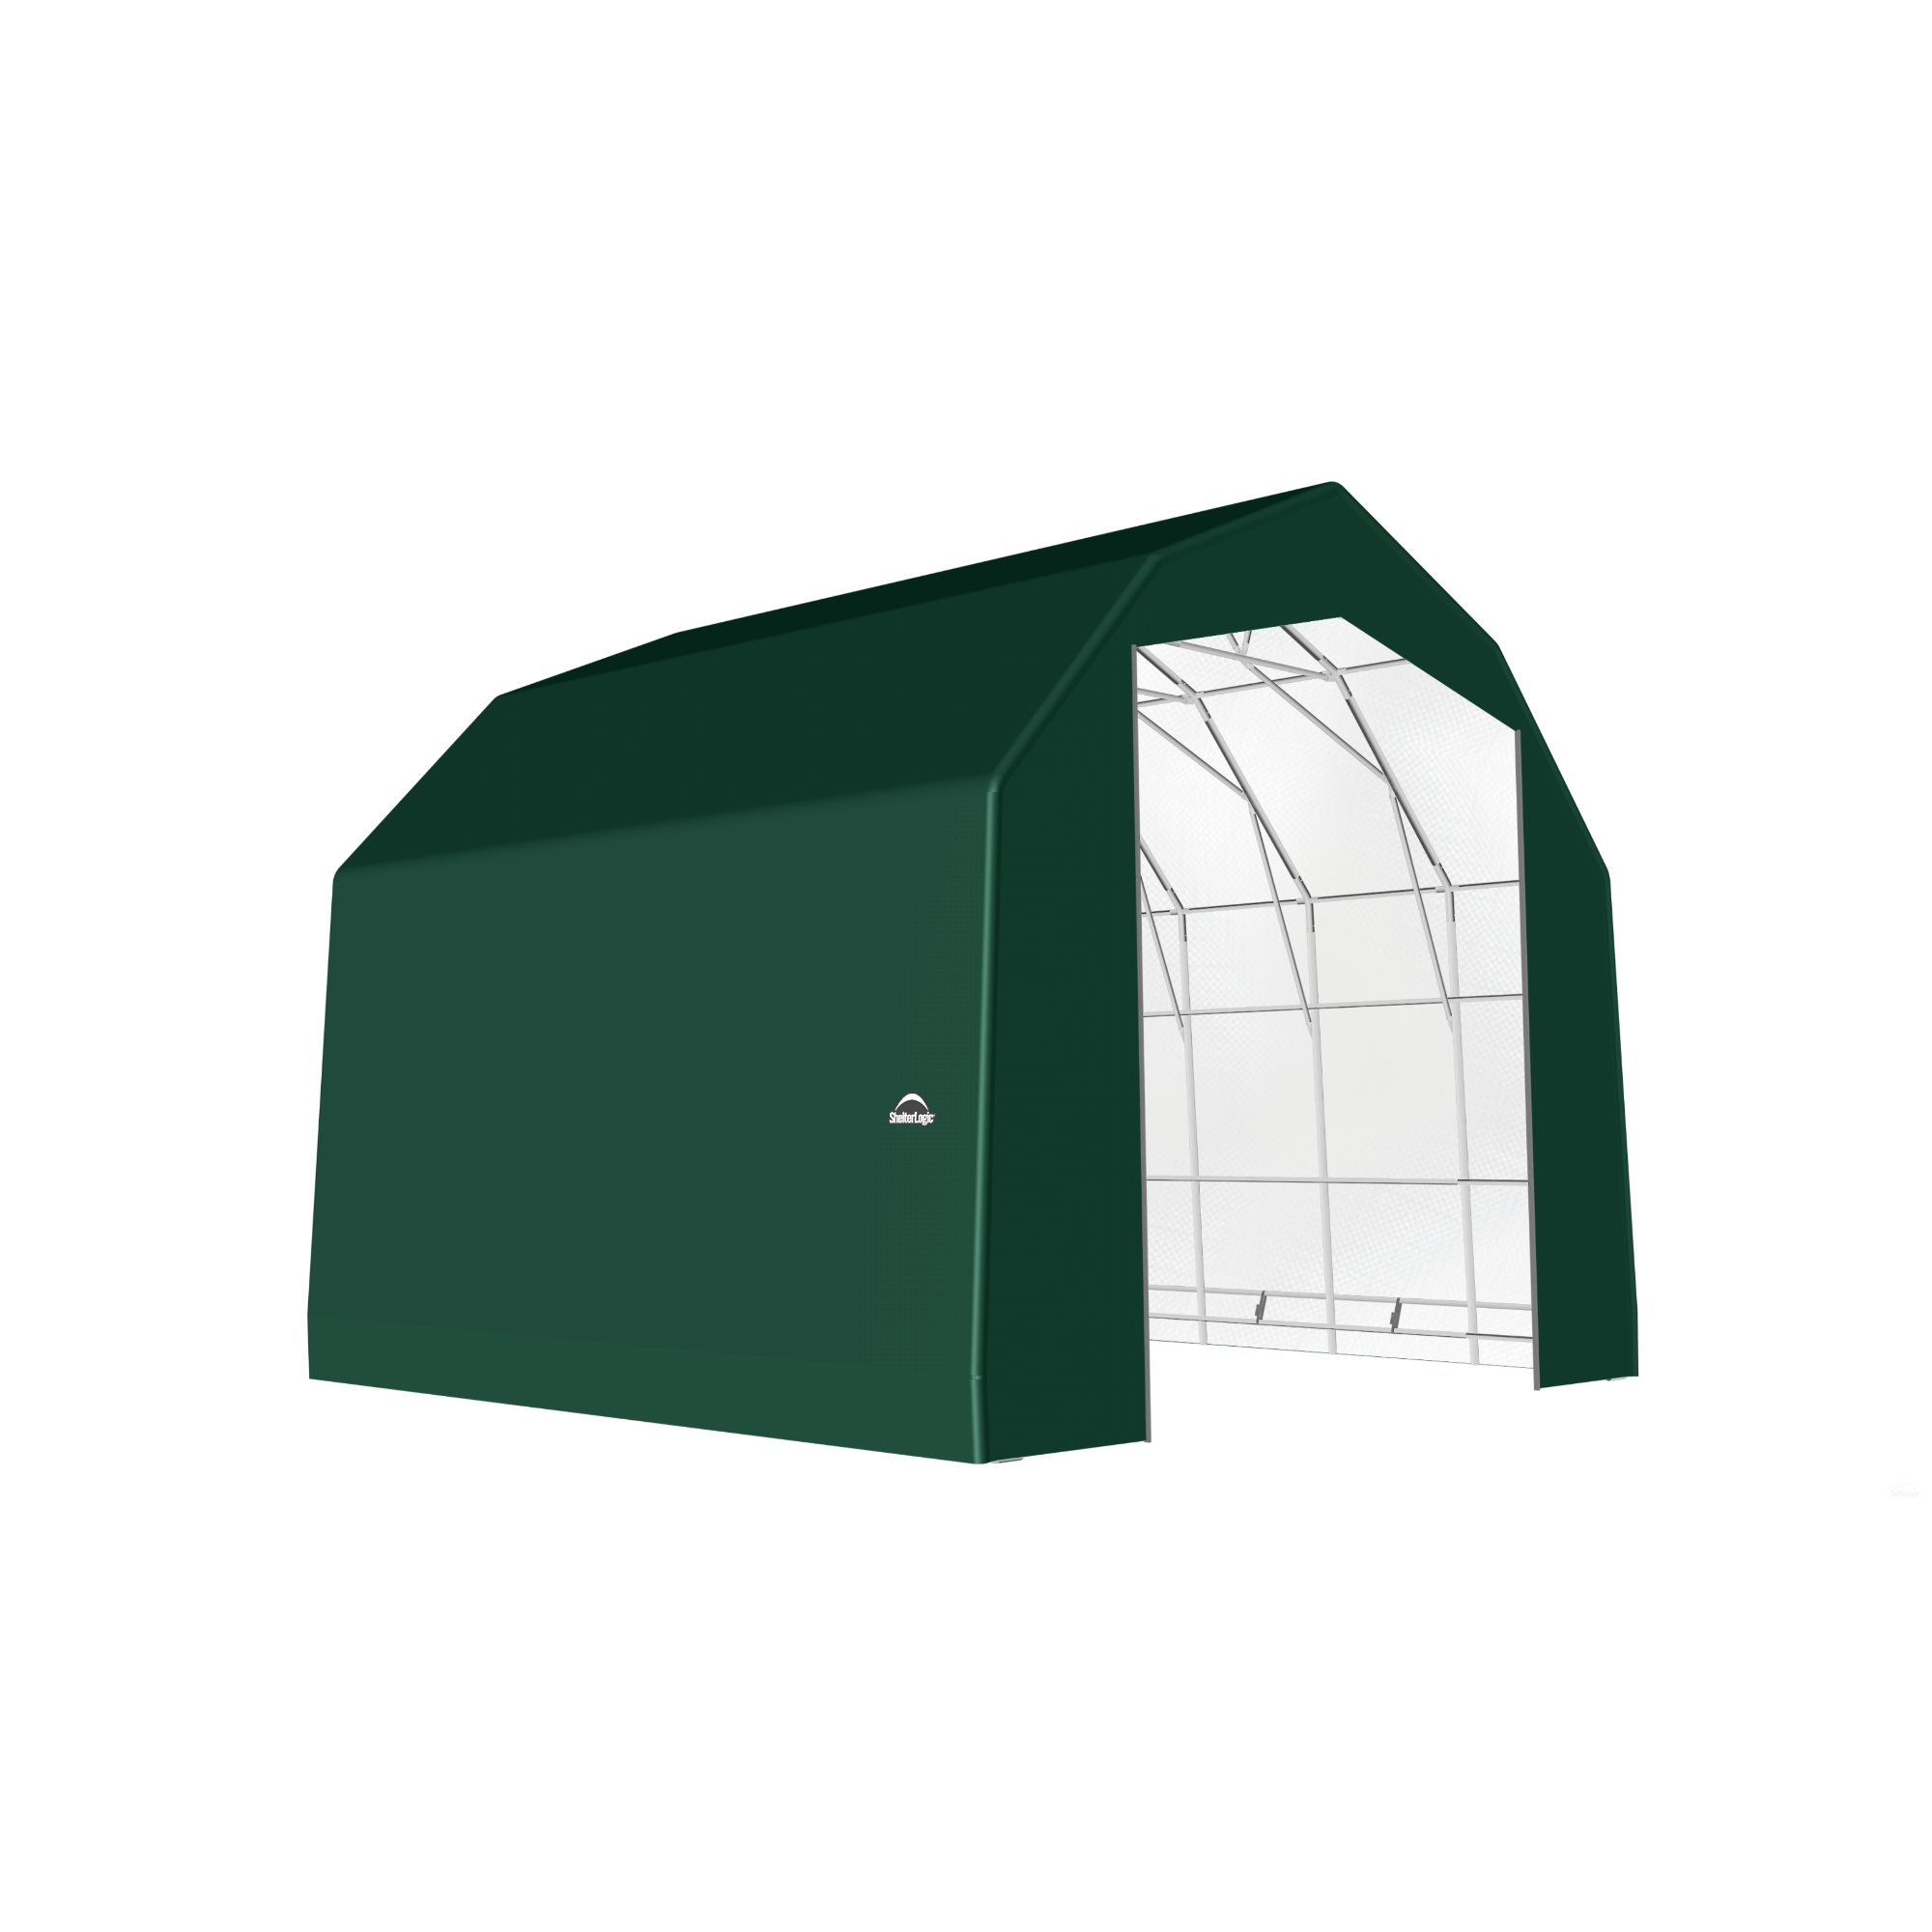 SP Barn 25X28X20 Green 14 oz PE Shelter